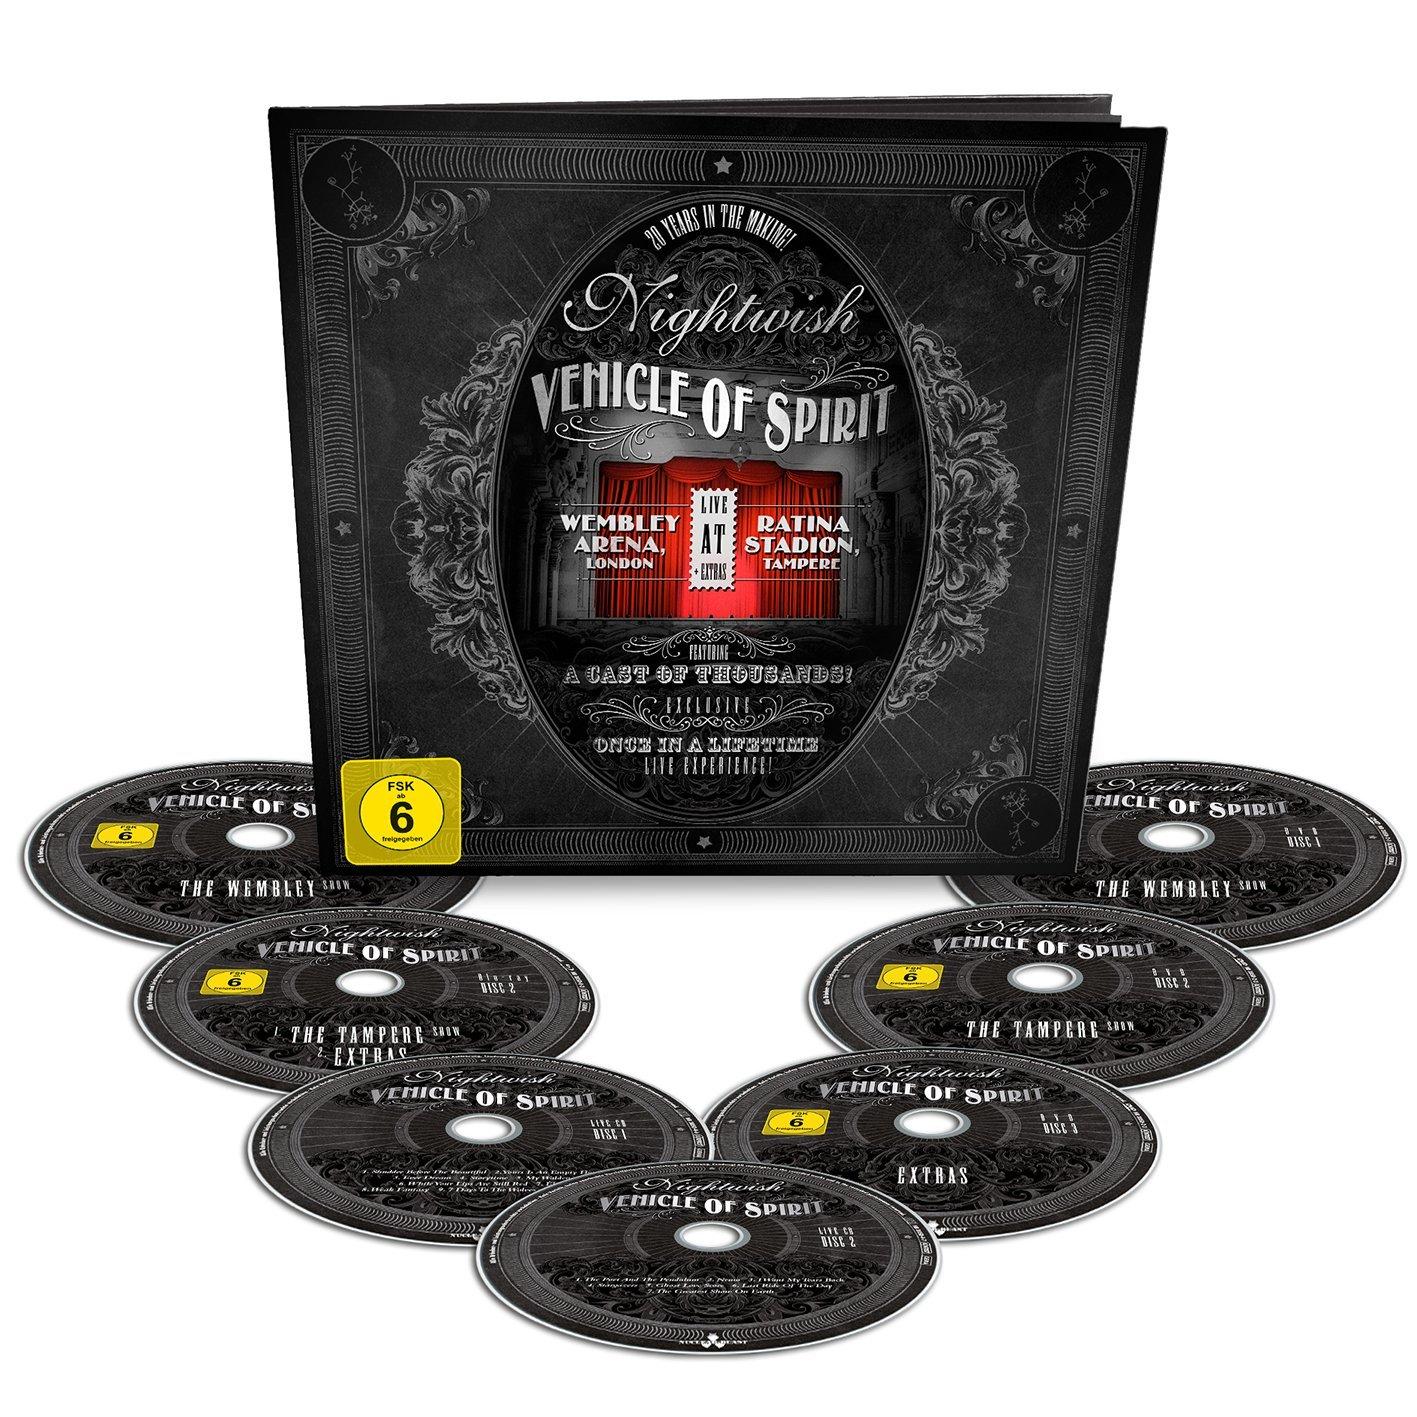 Bcd Nightwish - Vehicle Of Spirit Earbook Ltd.  2dvd+2brd+2cd ... 2a76d2803d2